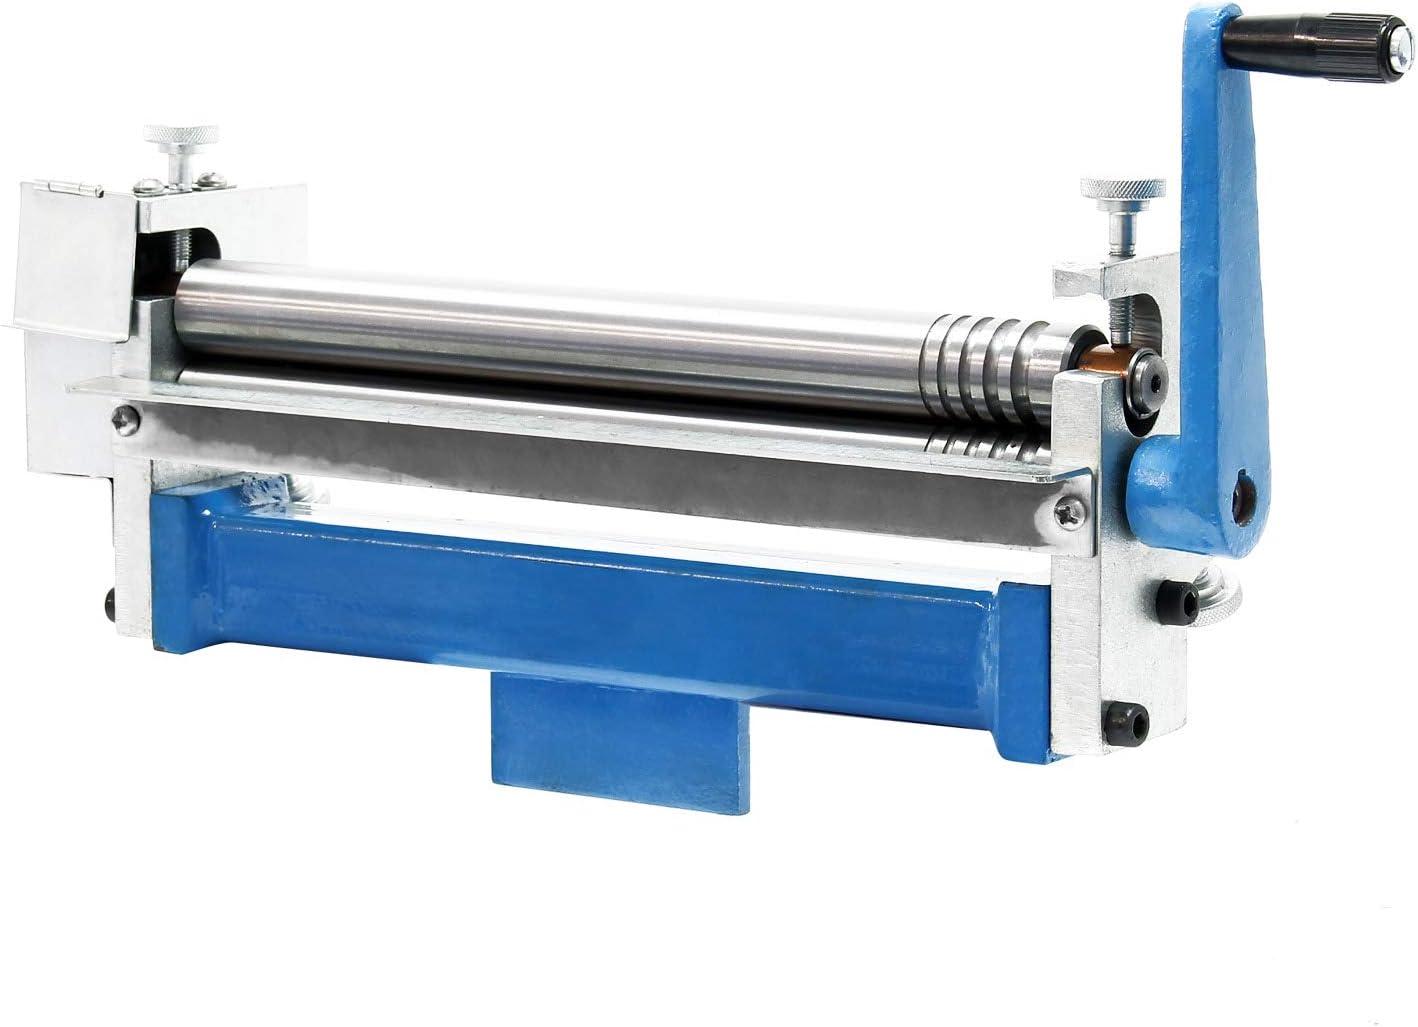 Drei-Walzen Rundbiegemaschine f/ür Werkst/ücke bis 250mm Biegemaschine Rundbiegeger/ät Blechbearbeitung